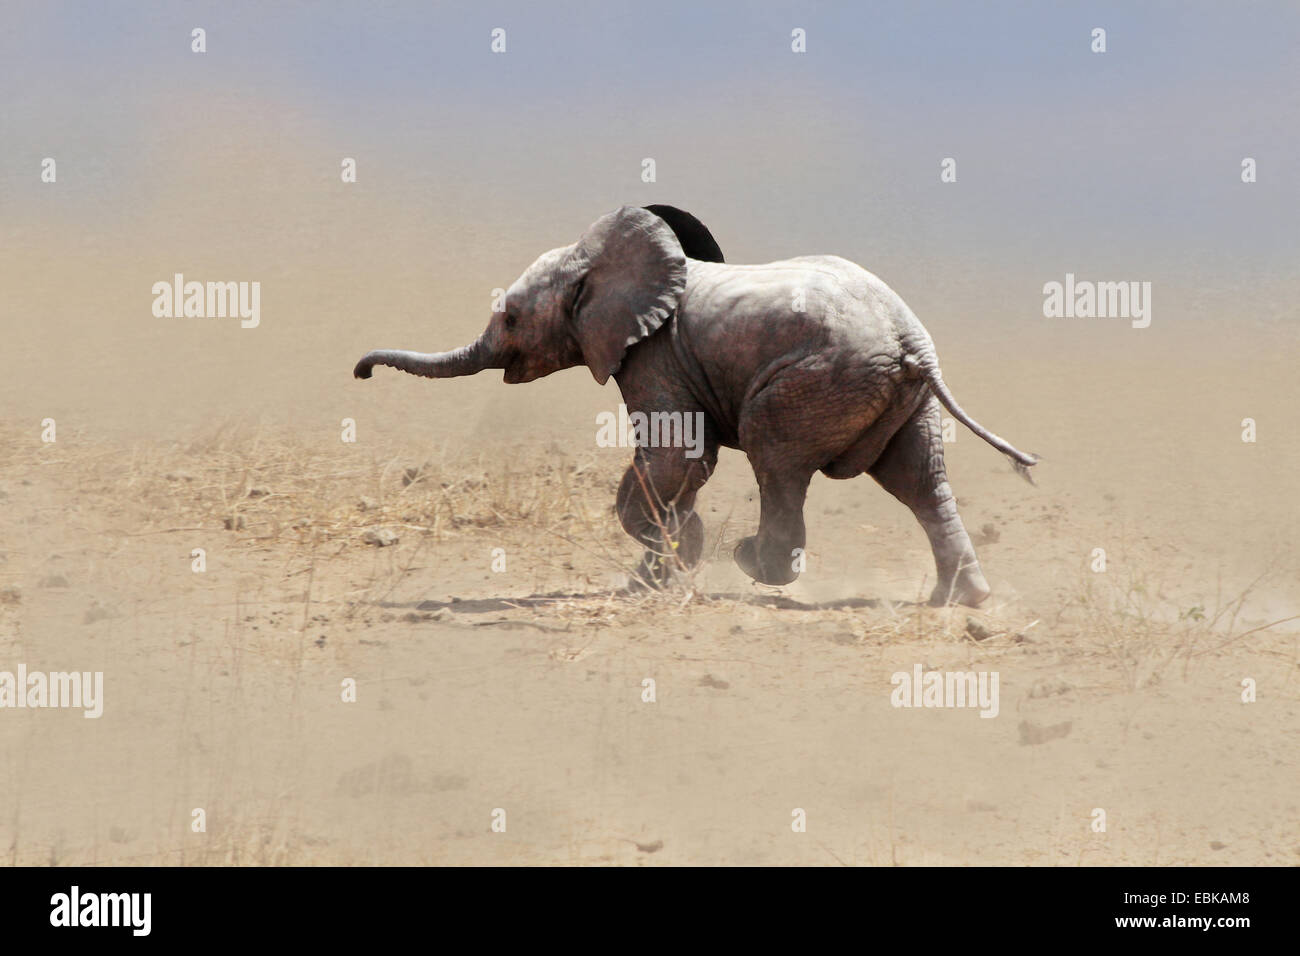 Elefante africano (Loxodonta africana), baby elephant in esecuzione attraverso una tempesta di sabbia, Kenya, Amboseli Immagini Stock